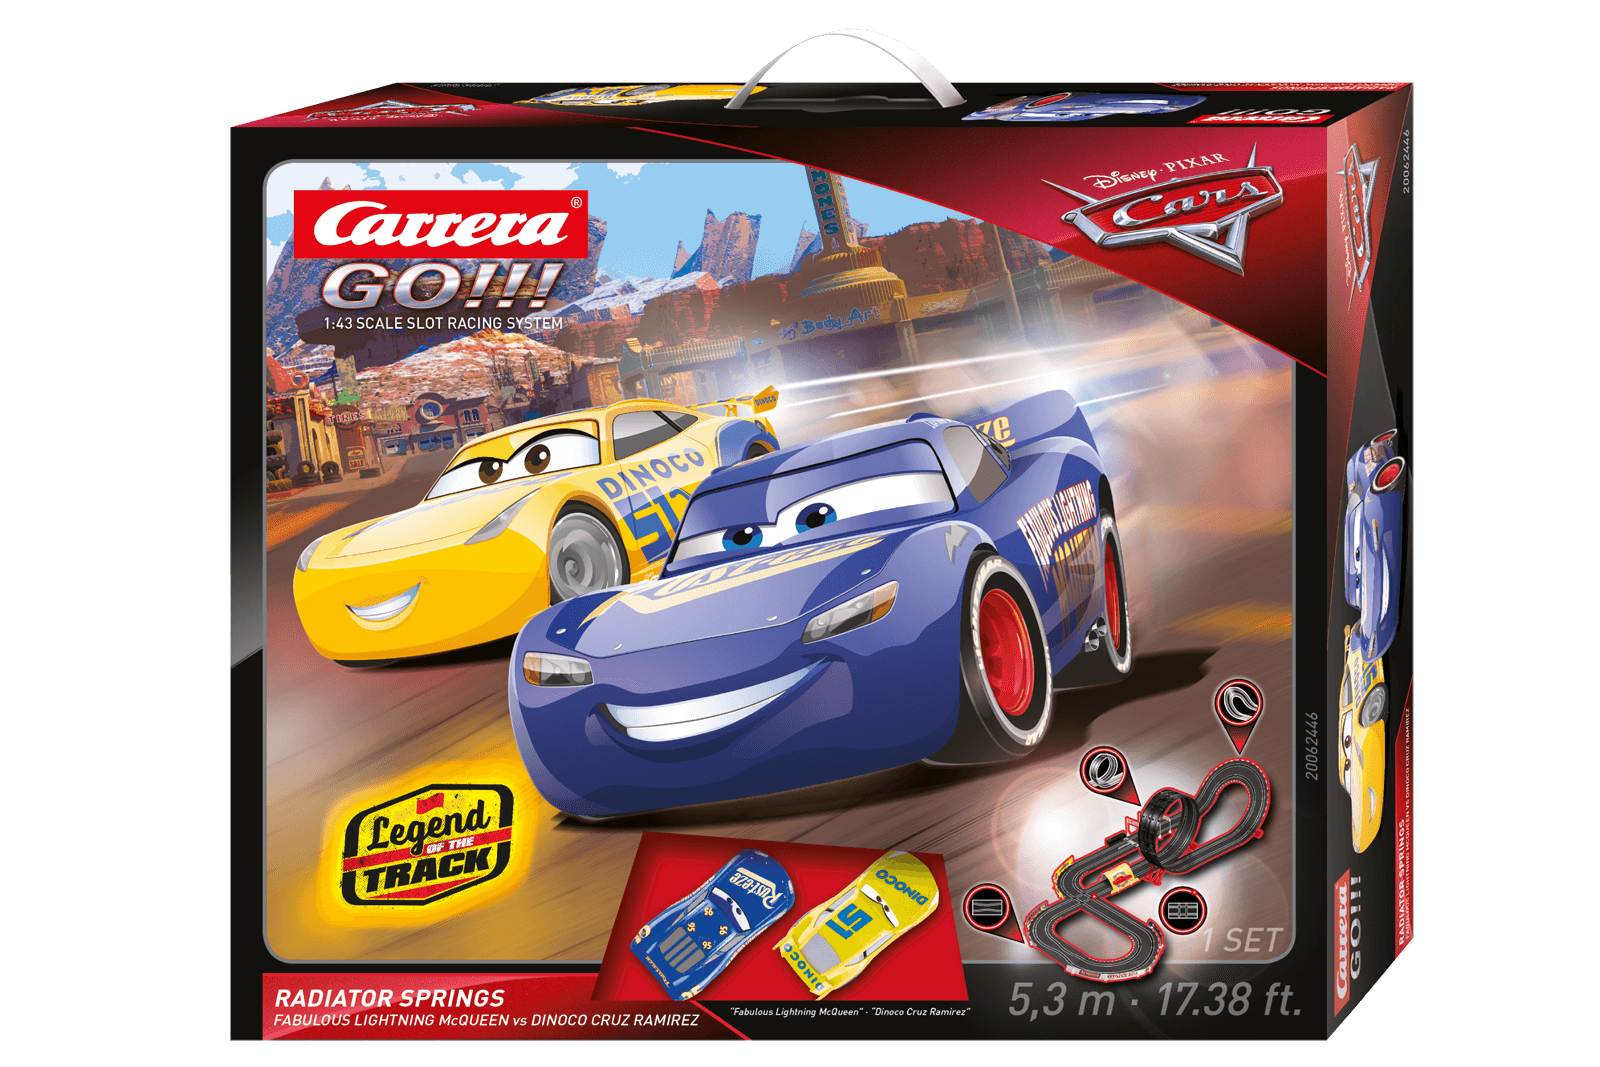 62446 Go!!! Disney·Pixar Cars - Radiator Springs, Carrera